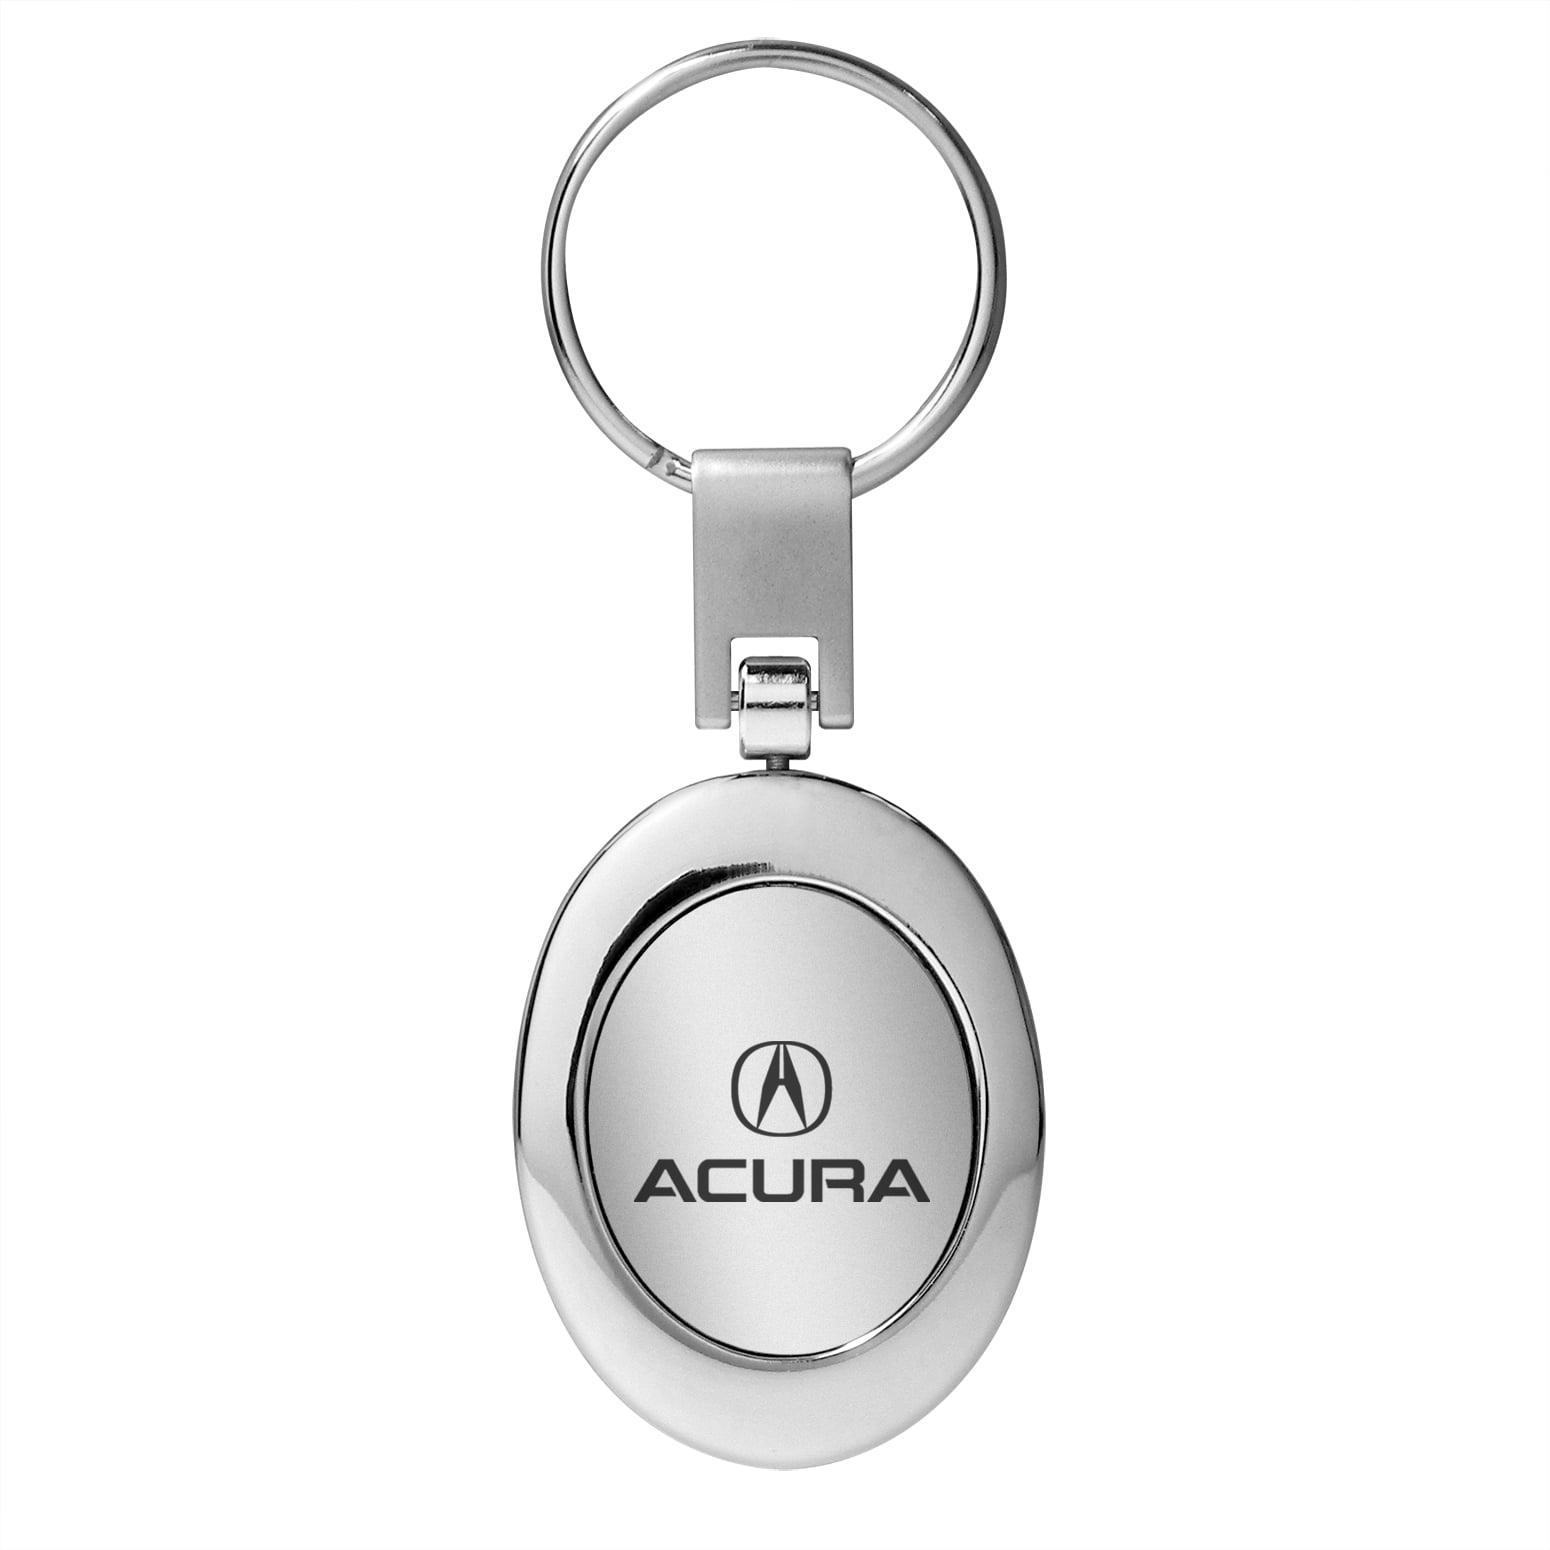 Acura Chrome Oval Metal Key Chain Keychain Walmartcom - Acura keychain